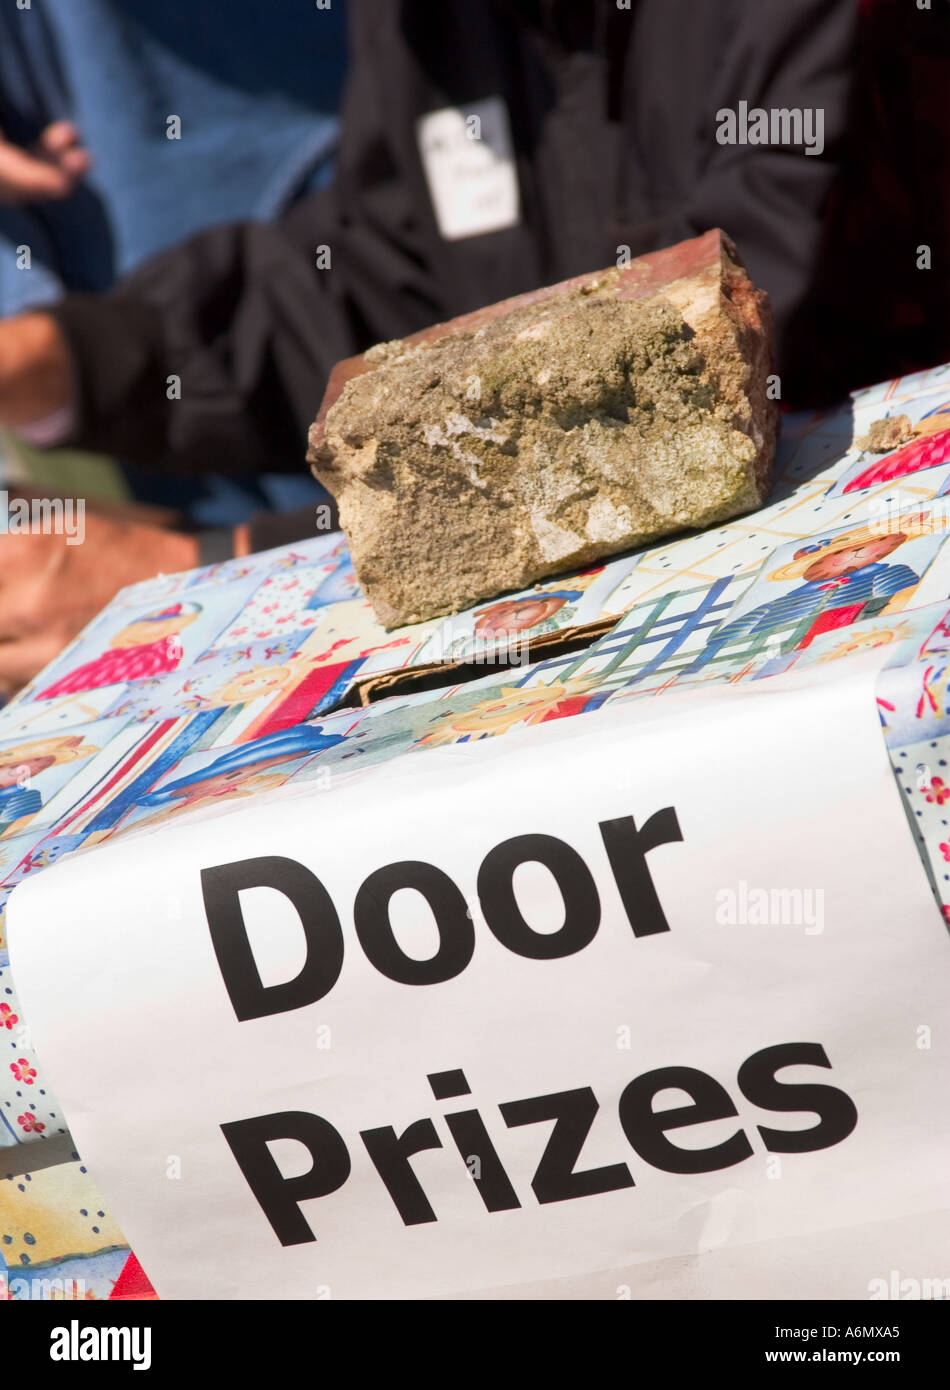 stock photo showing door prizes ticket box at heath springs school